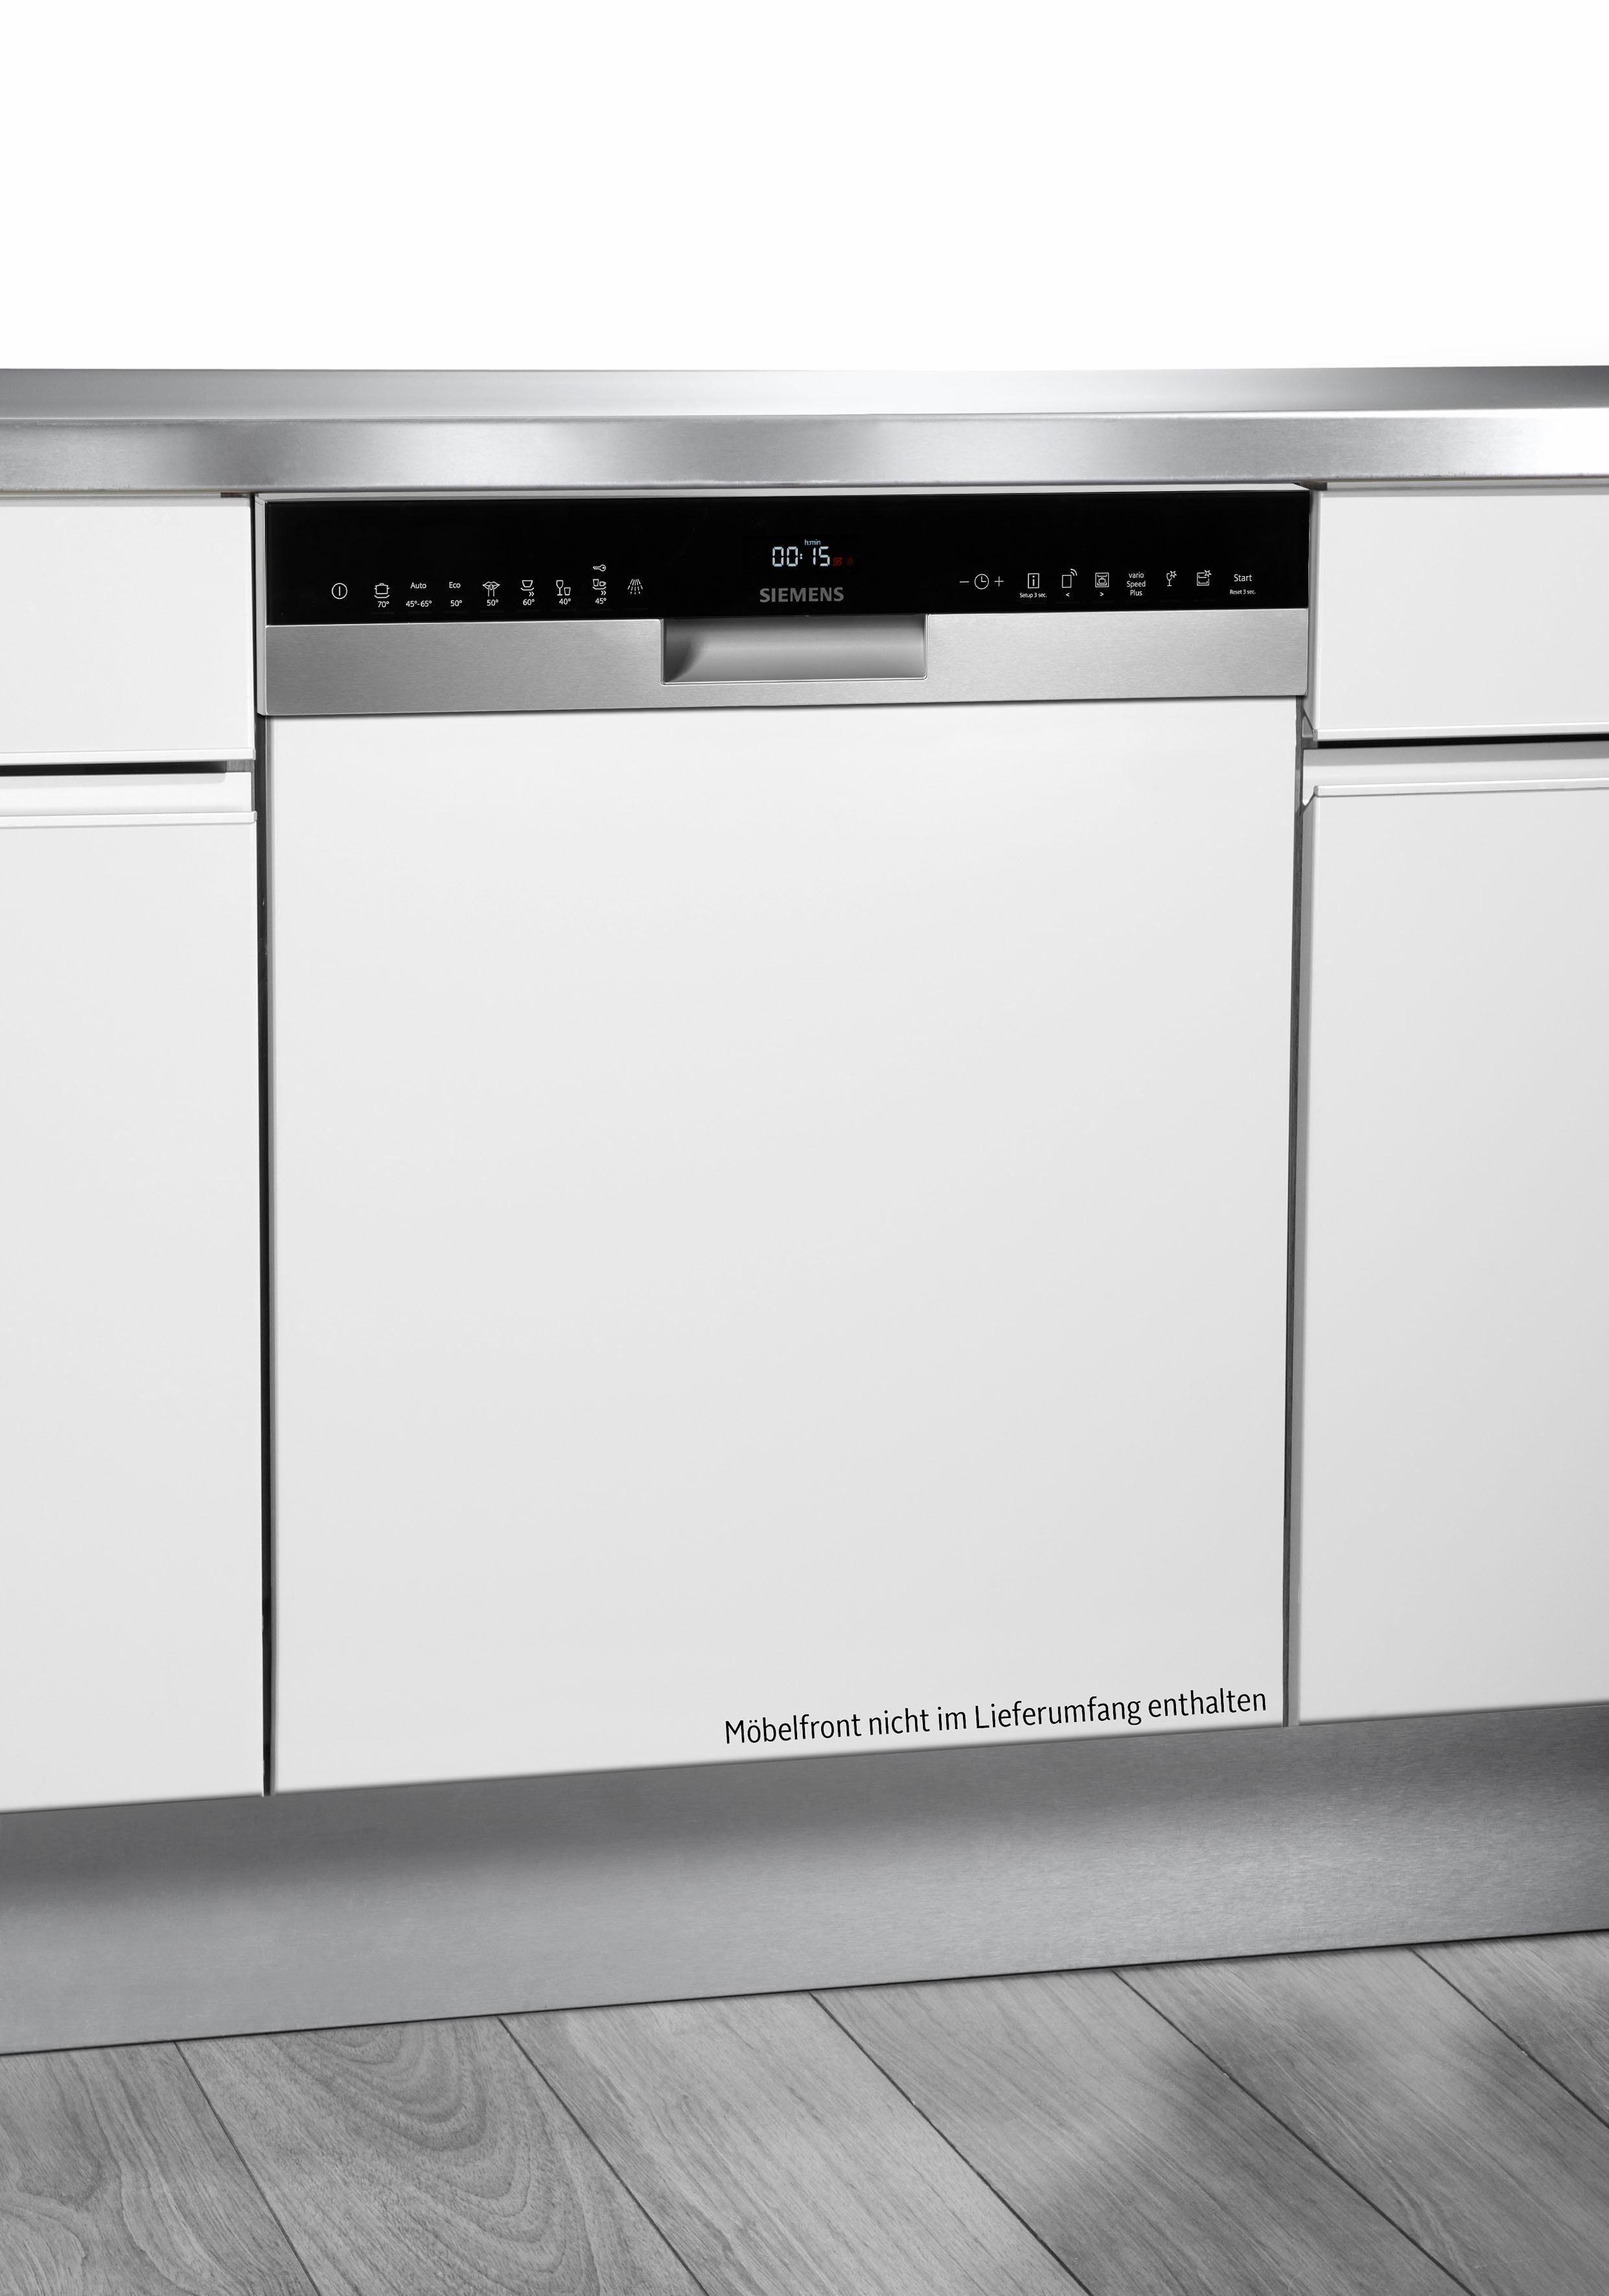 SIEMENS teilintegrierbarer Geschirrspüler iQ500, iQ500 SN558S06TE, 9,5 l, 14 Maßgedecke, Energieeffizienzklasse A+++